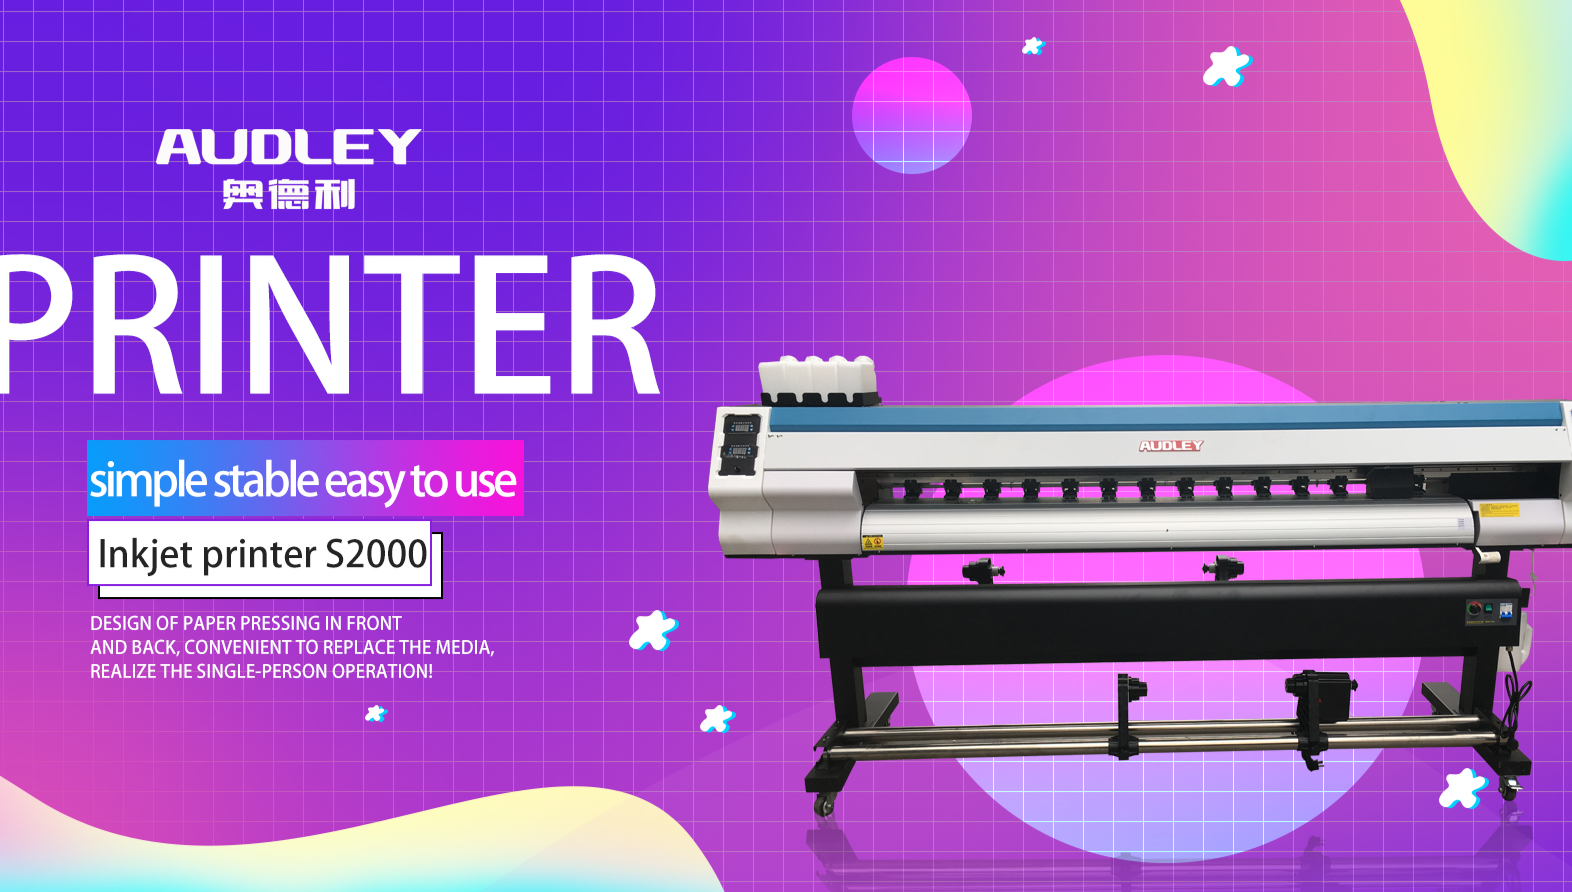 Preço barato industrial digital de grande formato impressora xp600 dx7 dx5 eco solvente IMPRESSORA jato de tinta cmyk